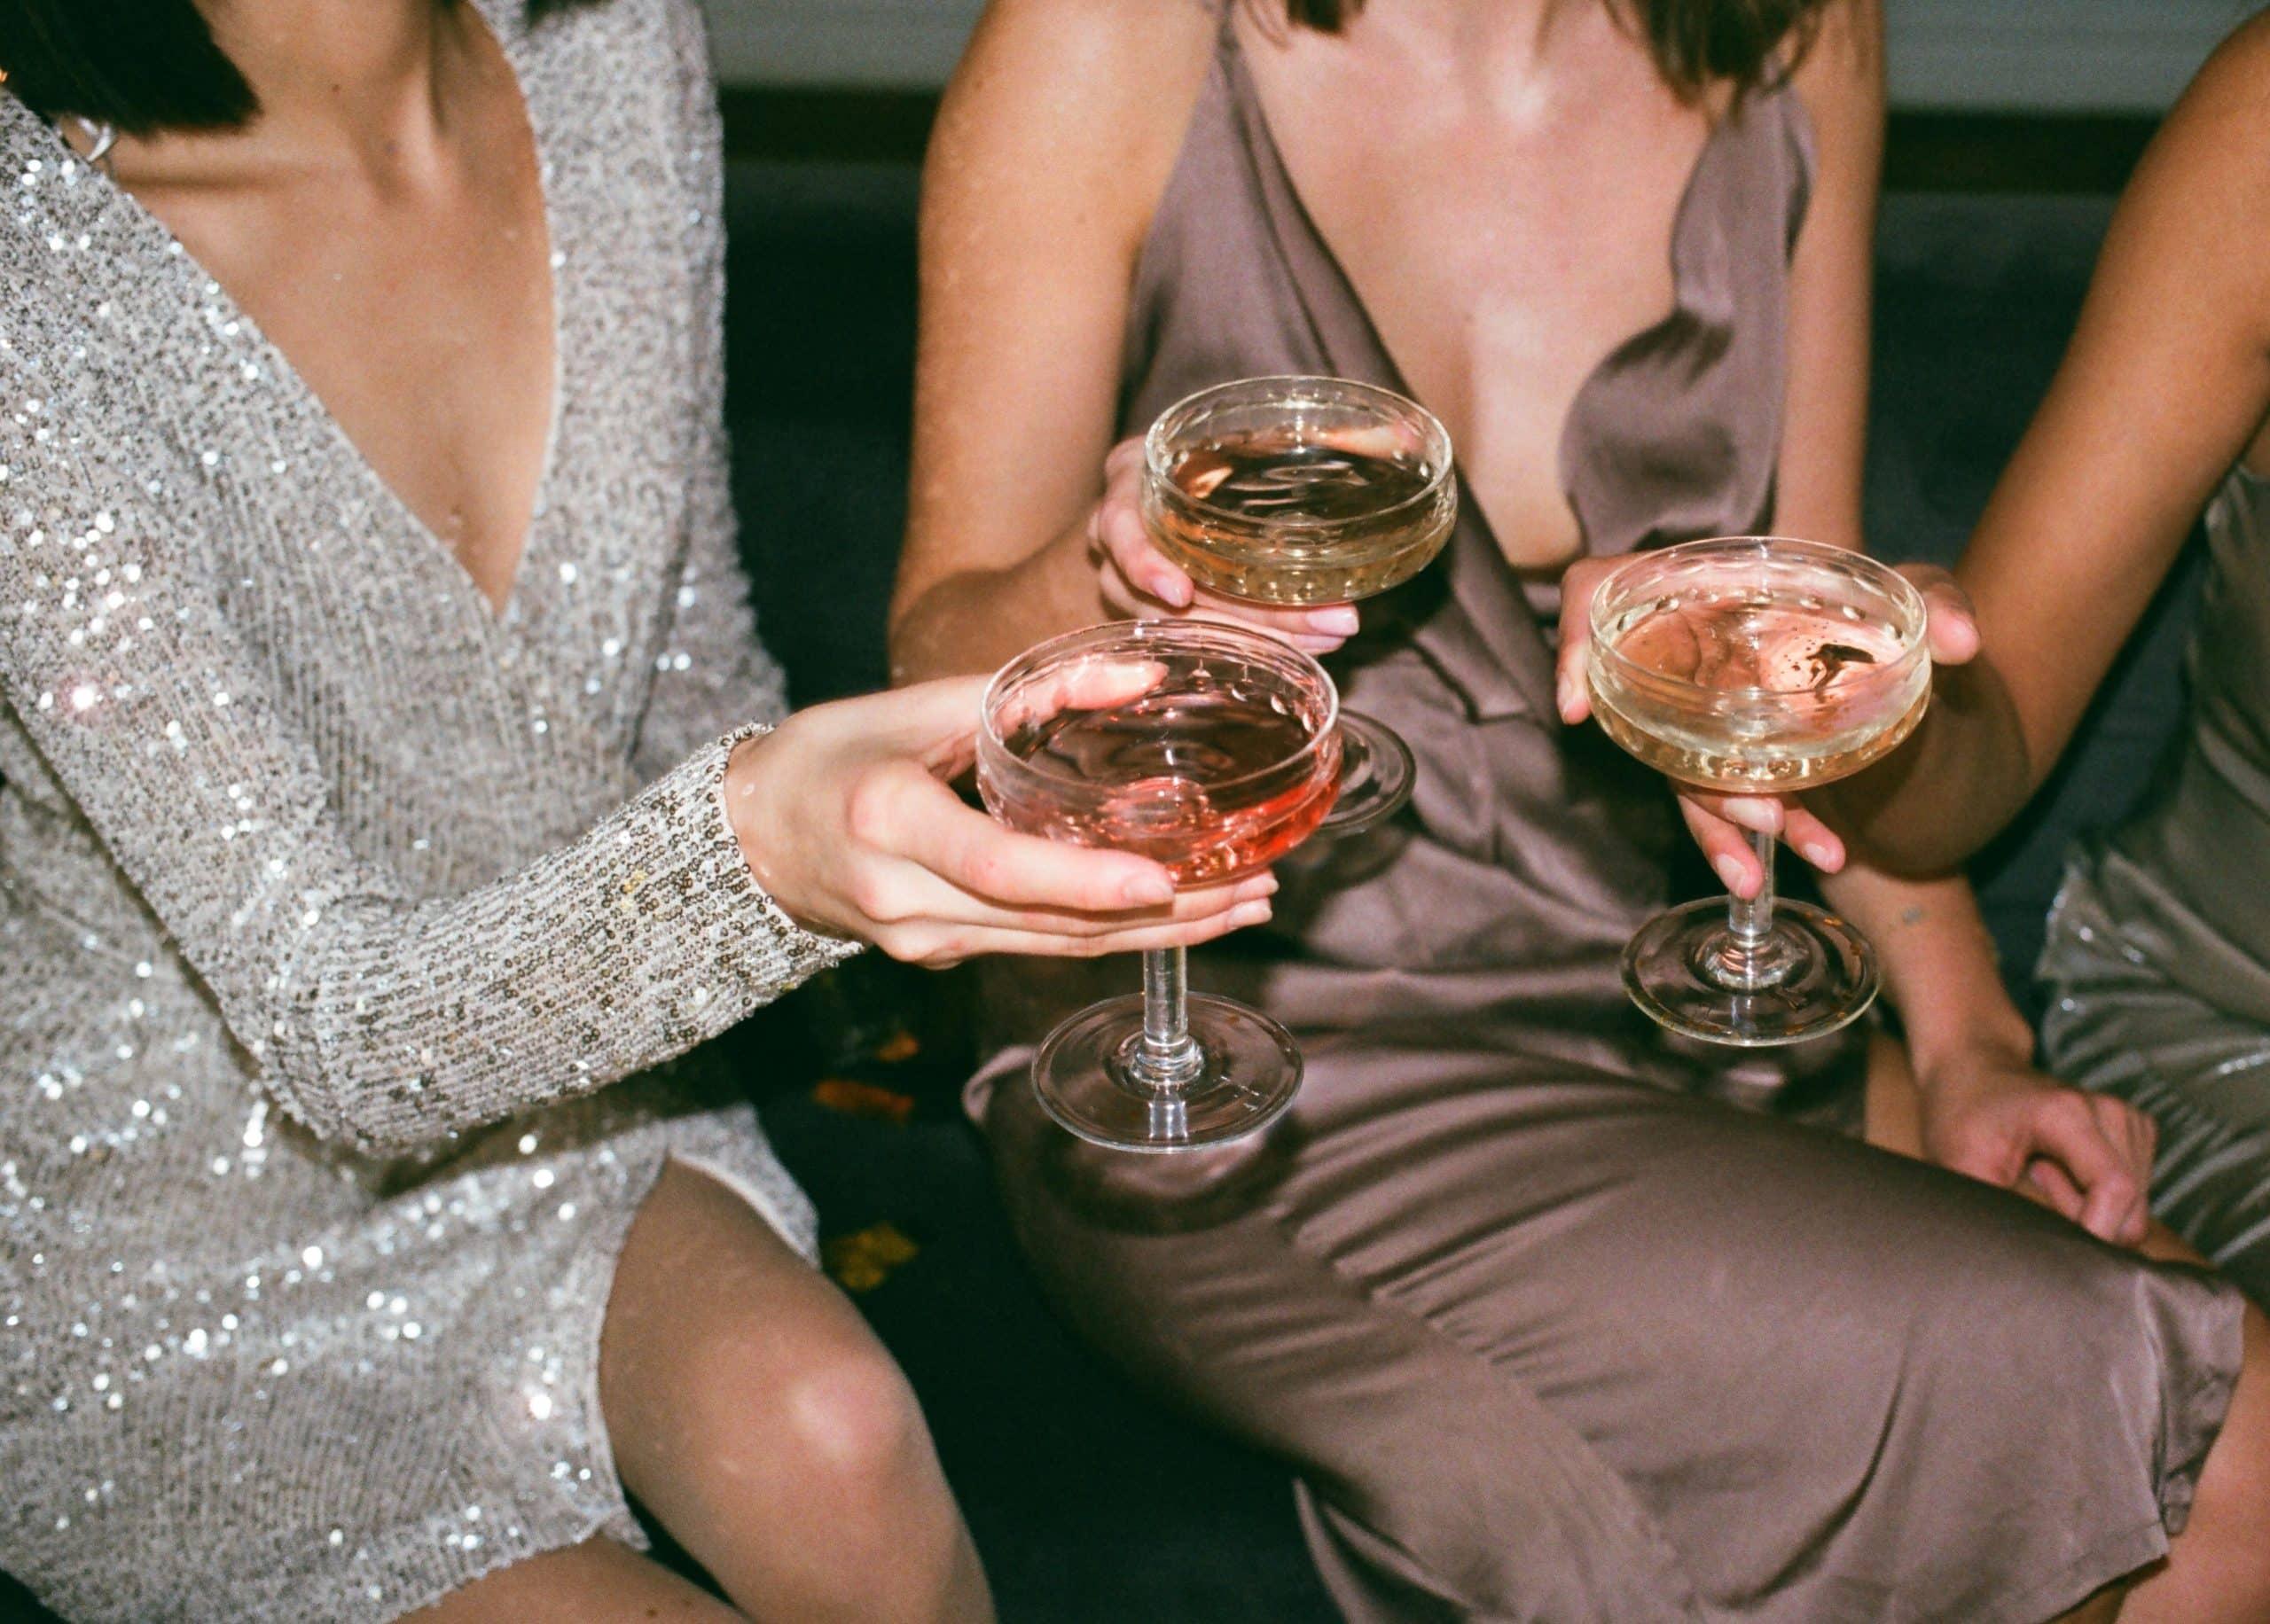 Fotografia de mulheres bebendo